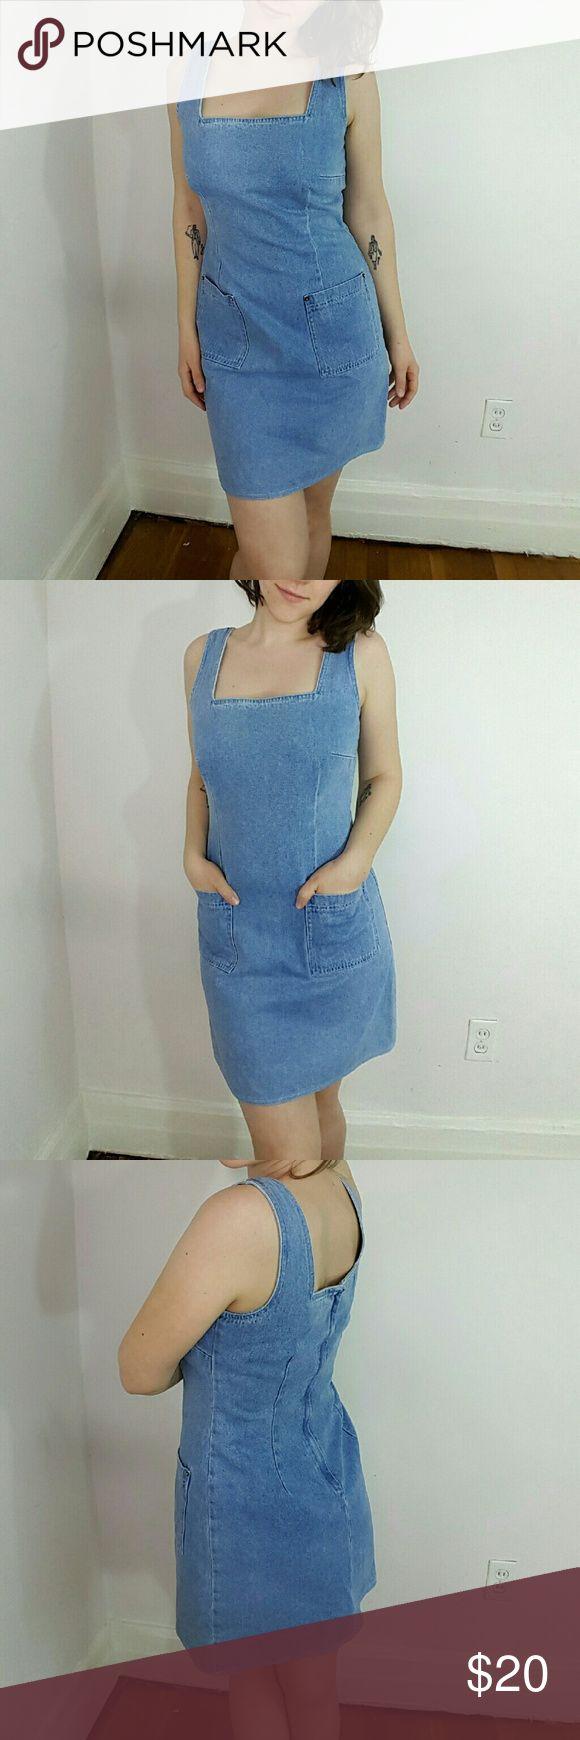 "Vintage Denim Dress Vintage Denim Dress. By Moda International. 100% cotton, made in USA. Marked a size 6- 17"" armpit to armpit, 33.5"" long from top of sleeve to hem. Excellent condition. #denimdress #vintagedenim #90sdenim Vintage Dresses"